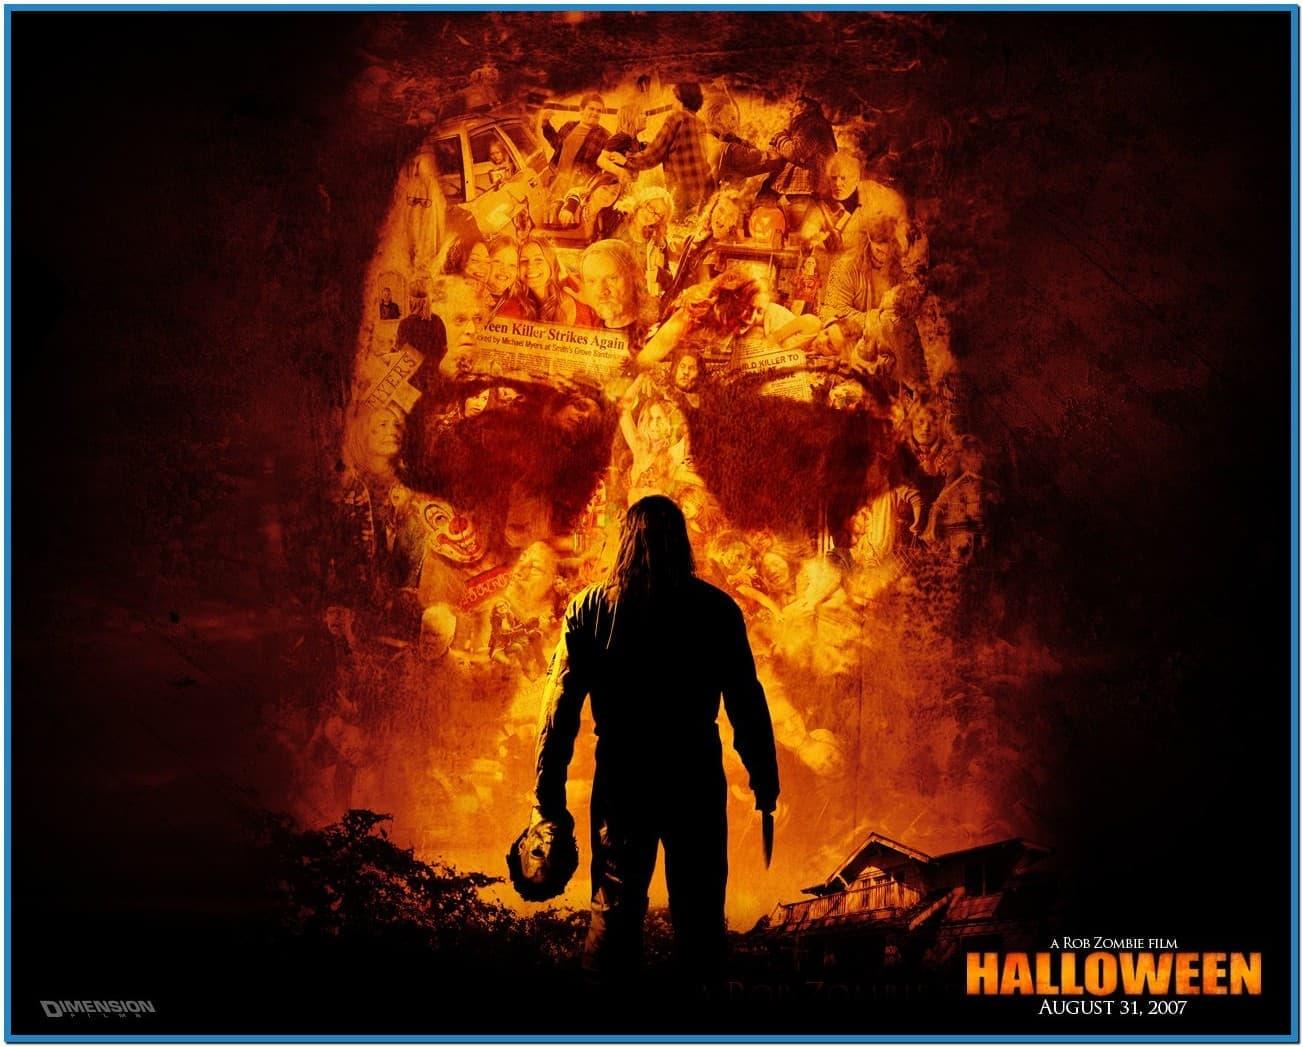 Halloween movie wallpaper screensavers   Download 1303x1047